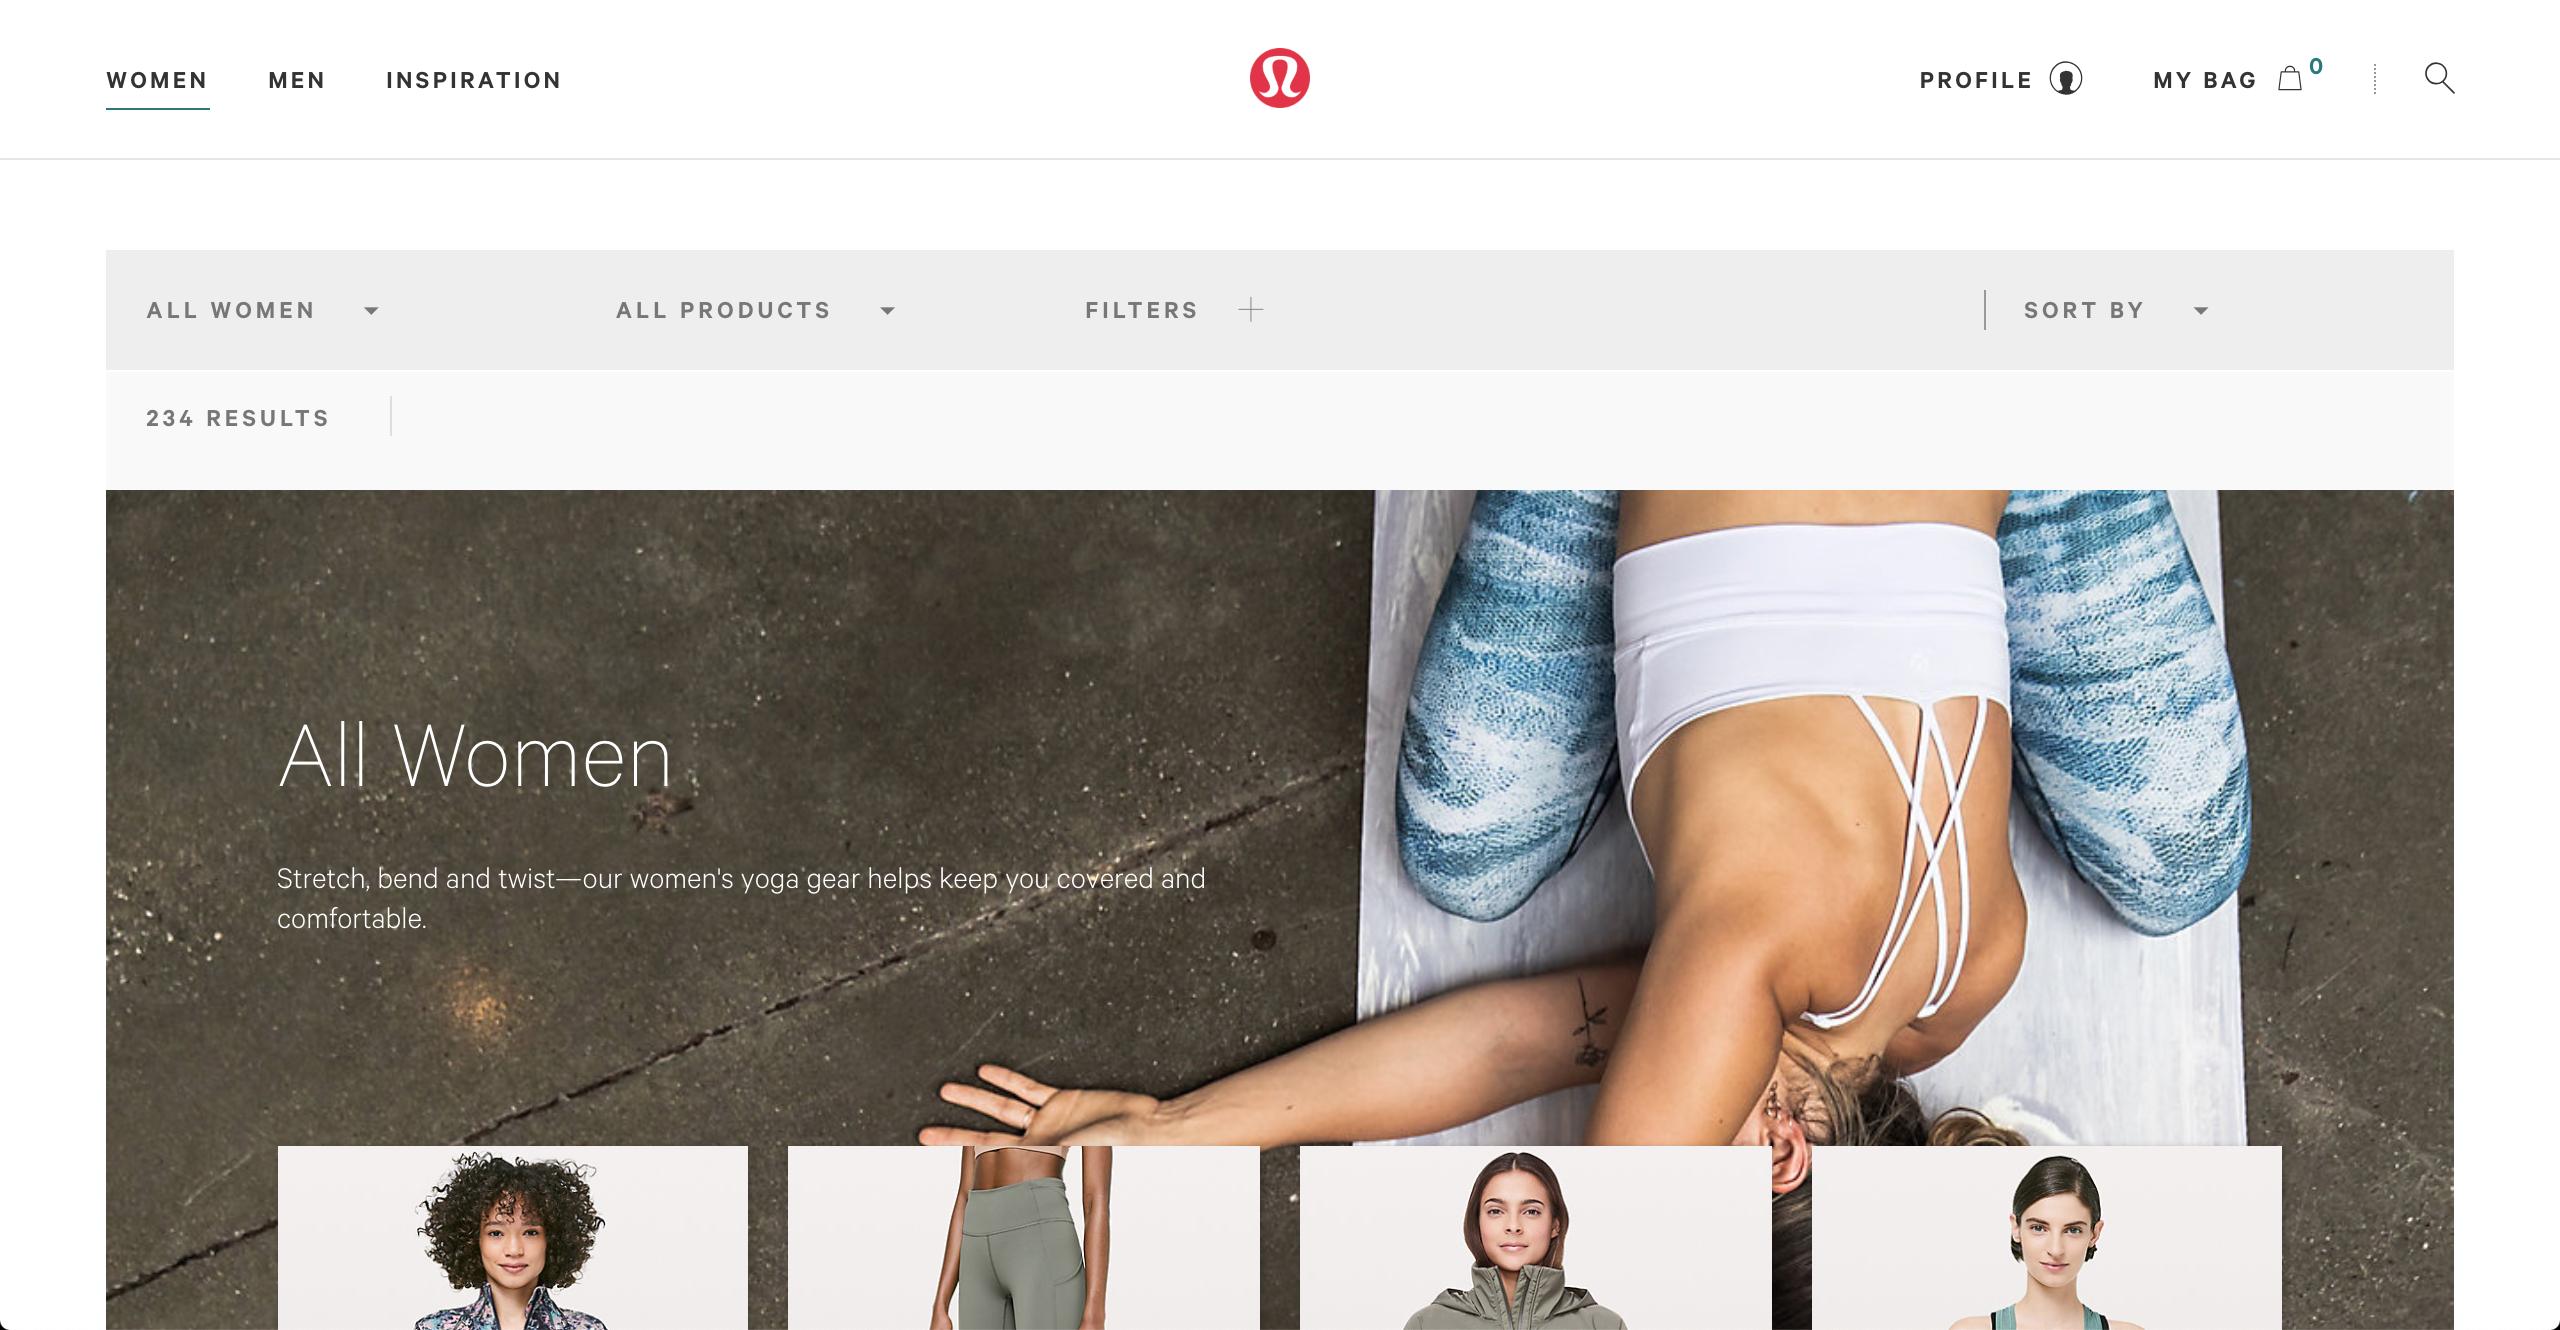 Lululemon women's apparel page